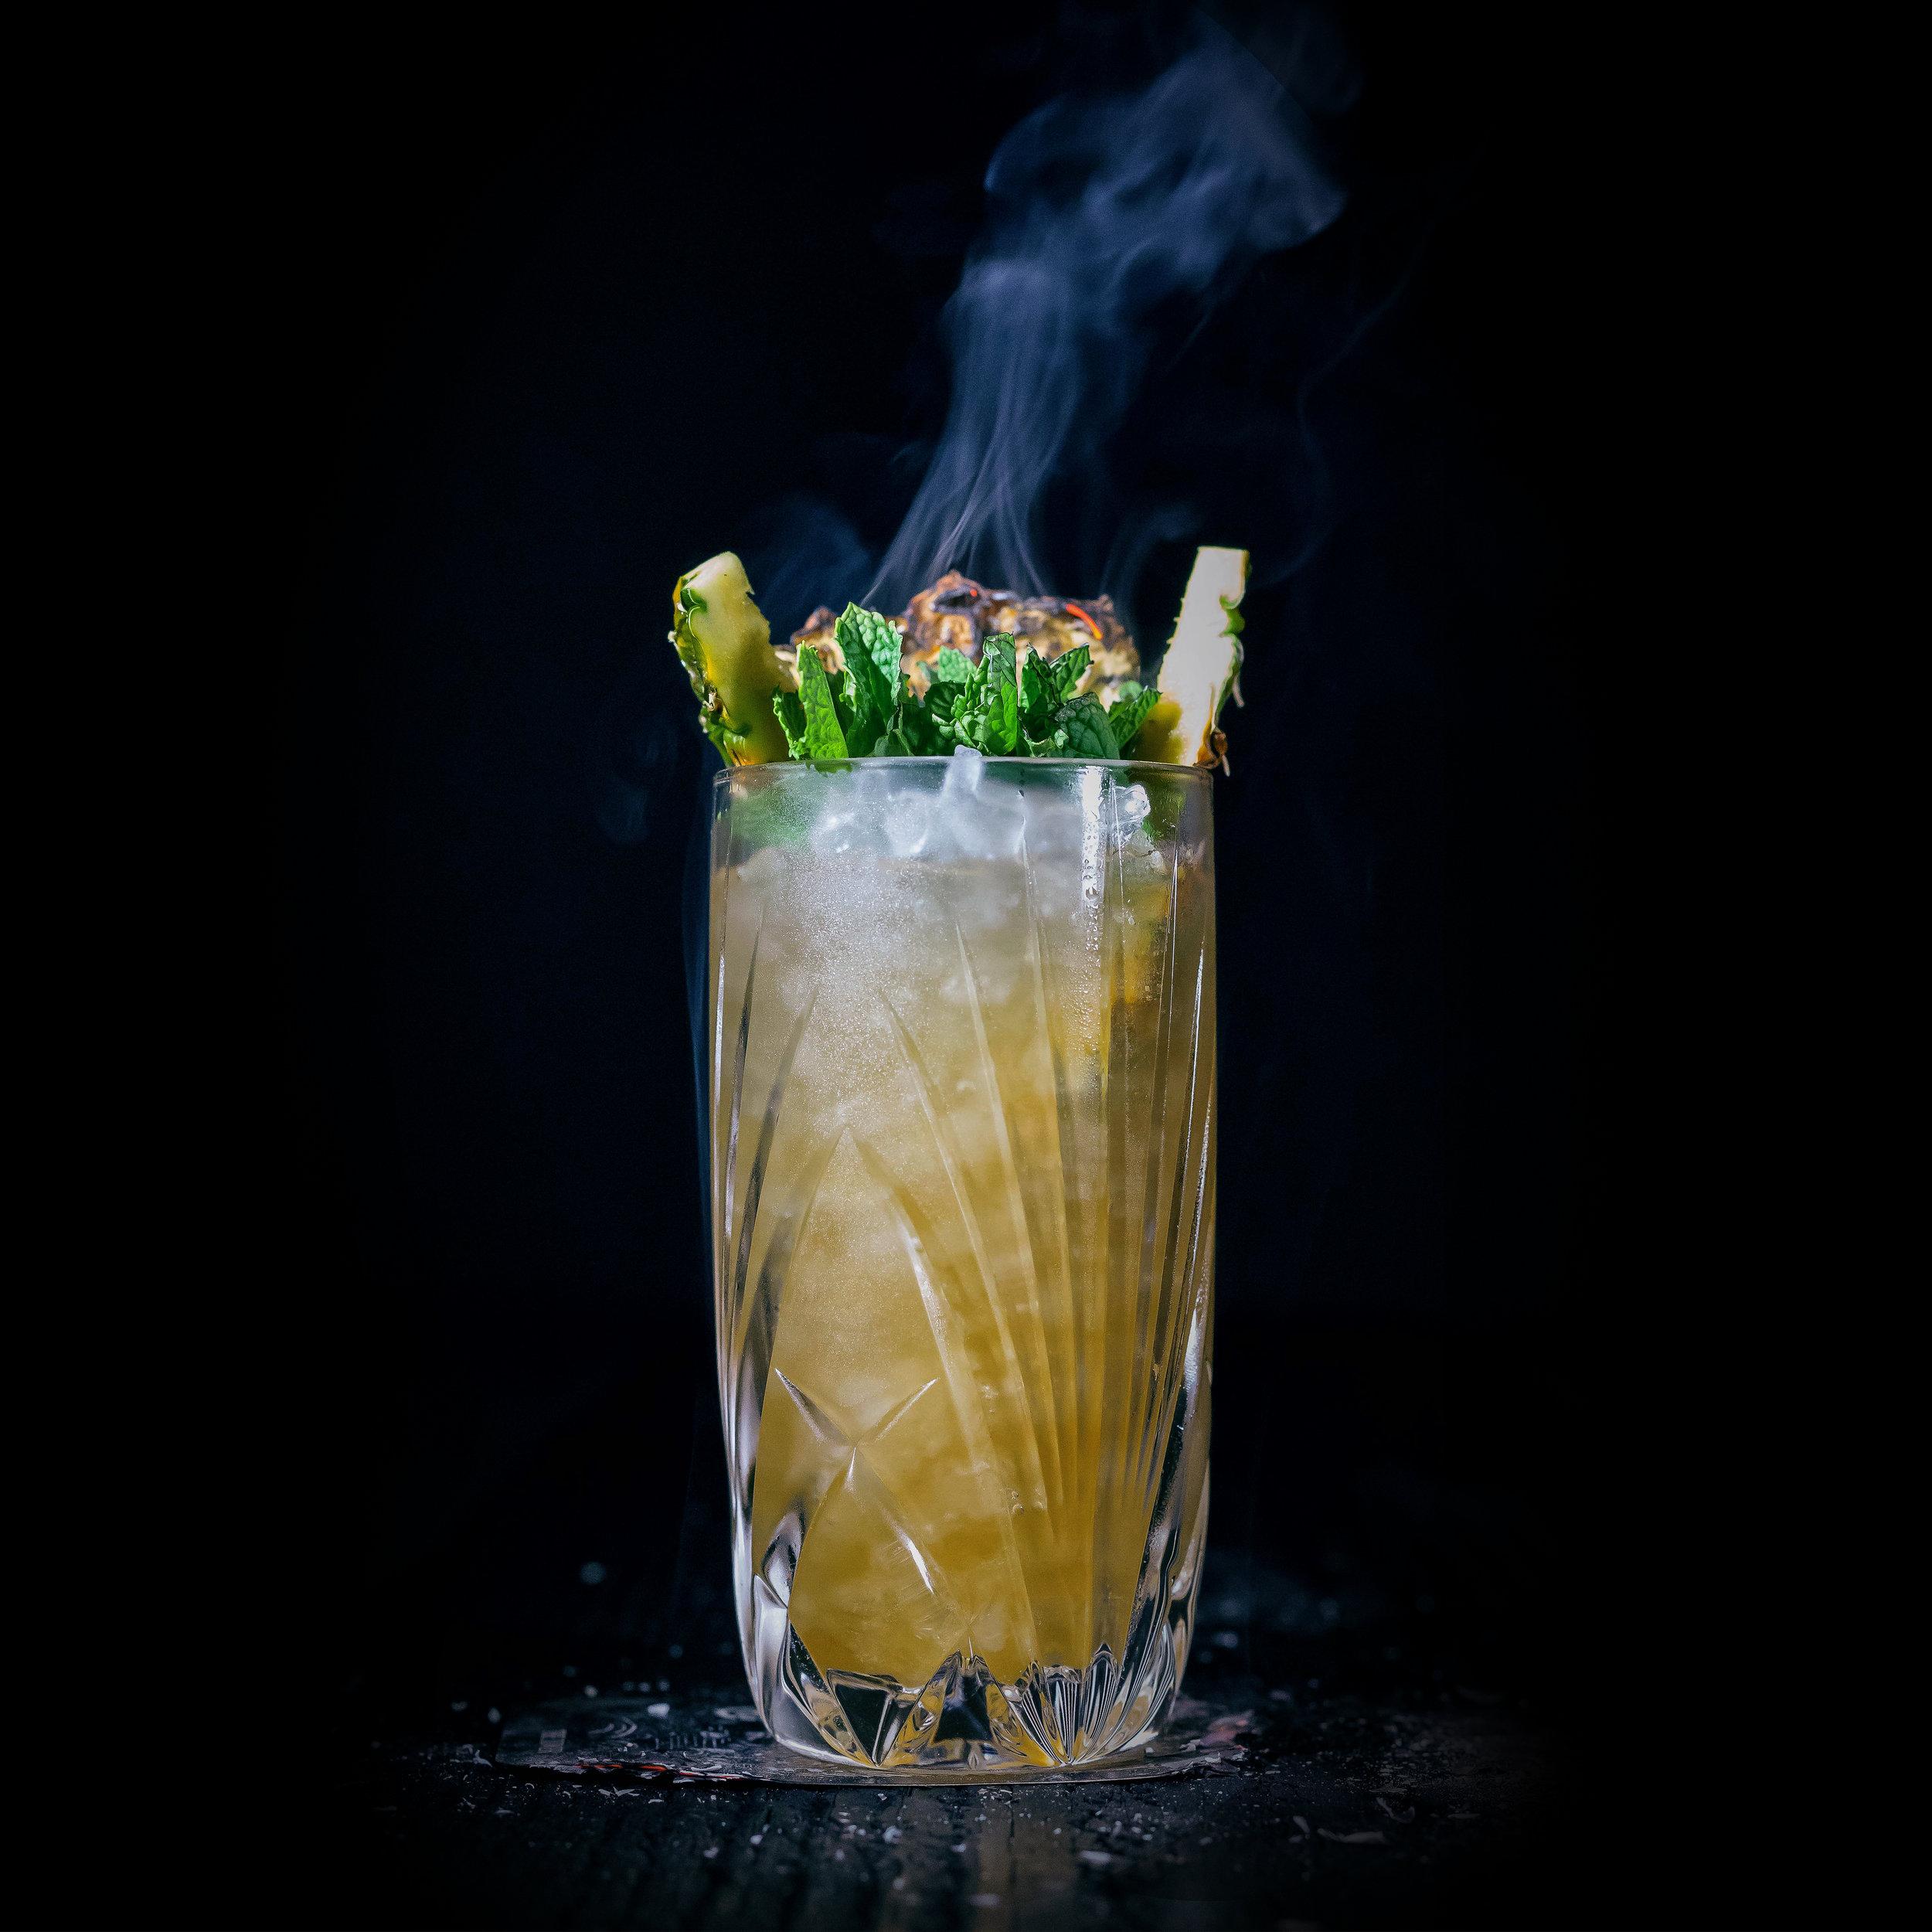 ZAPOTEC ZOMBIE  INGREDIENTS  - 2 oz. El Silencio Espadin - .5 oz. Dos Maderos 5x5 Rum - .5 oz. Hamilton 151 Rum - .75 oz. Passion Fruit Syrup - .75 oz. Demerara Syrup - .75 oz. Lime Juice - .75 oz. Lemon Juice - .75 oz. Pineapple Juice - Dash Angostura  METHOD  Shake & Pour Pineapple Leaves & Nutmeg - Pilsner Glass